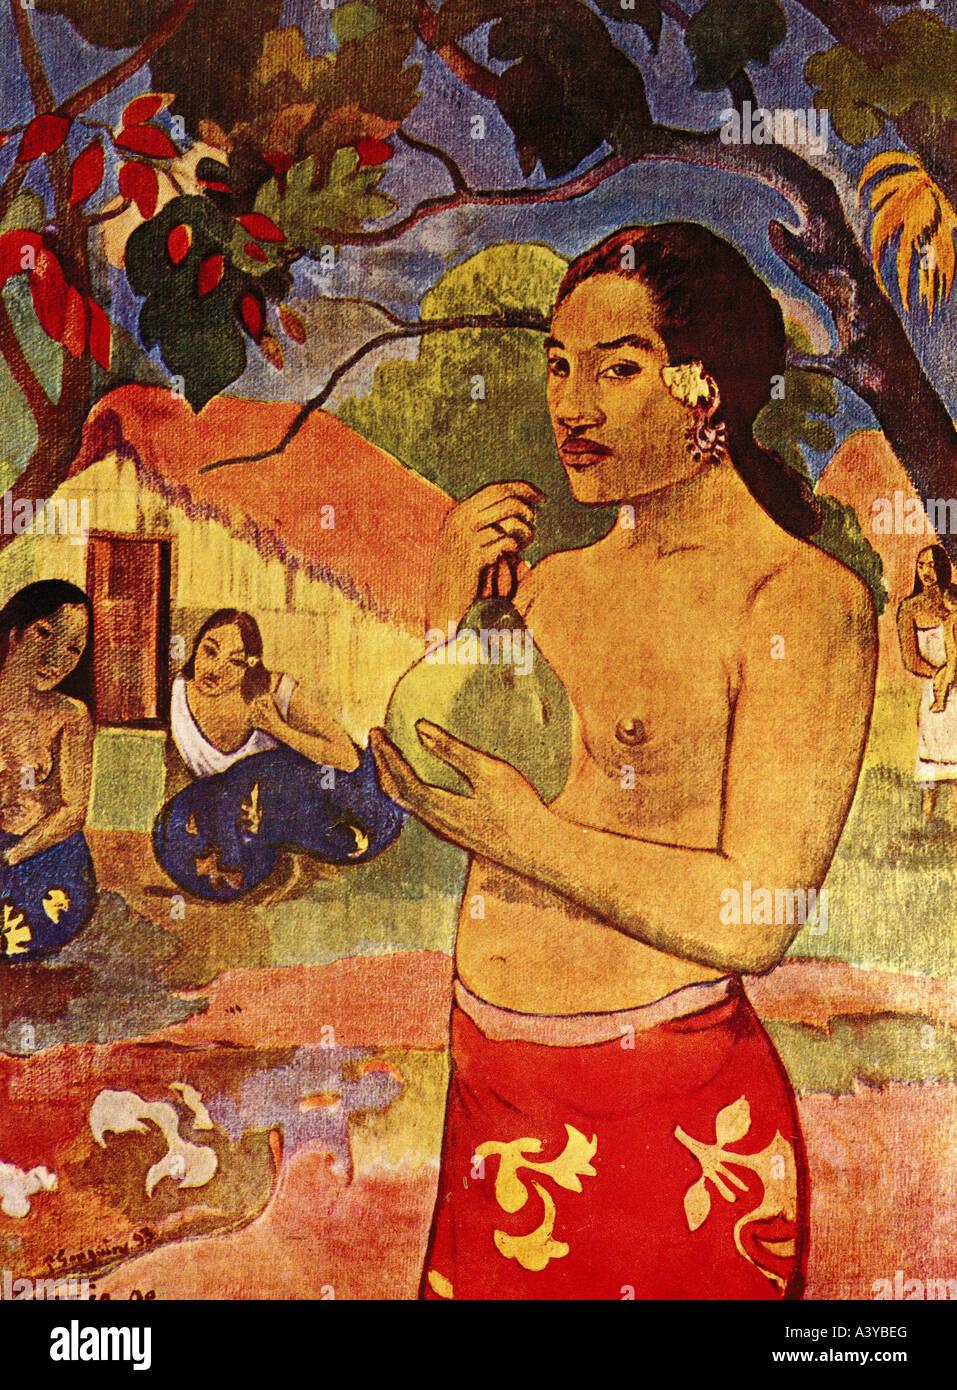 'Fine Arts, Gauguin, Paul, (1848 - 1903), peinture, 'femme Tahiti avec fruit', 1893, huile sur toile, Photo Stock